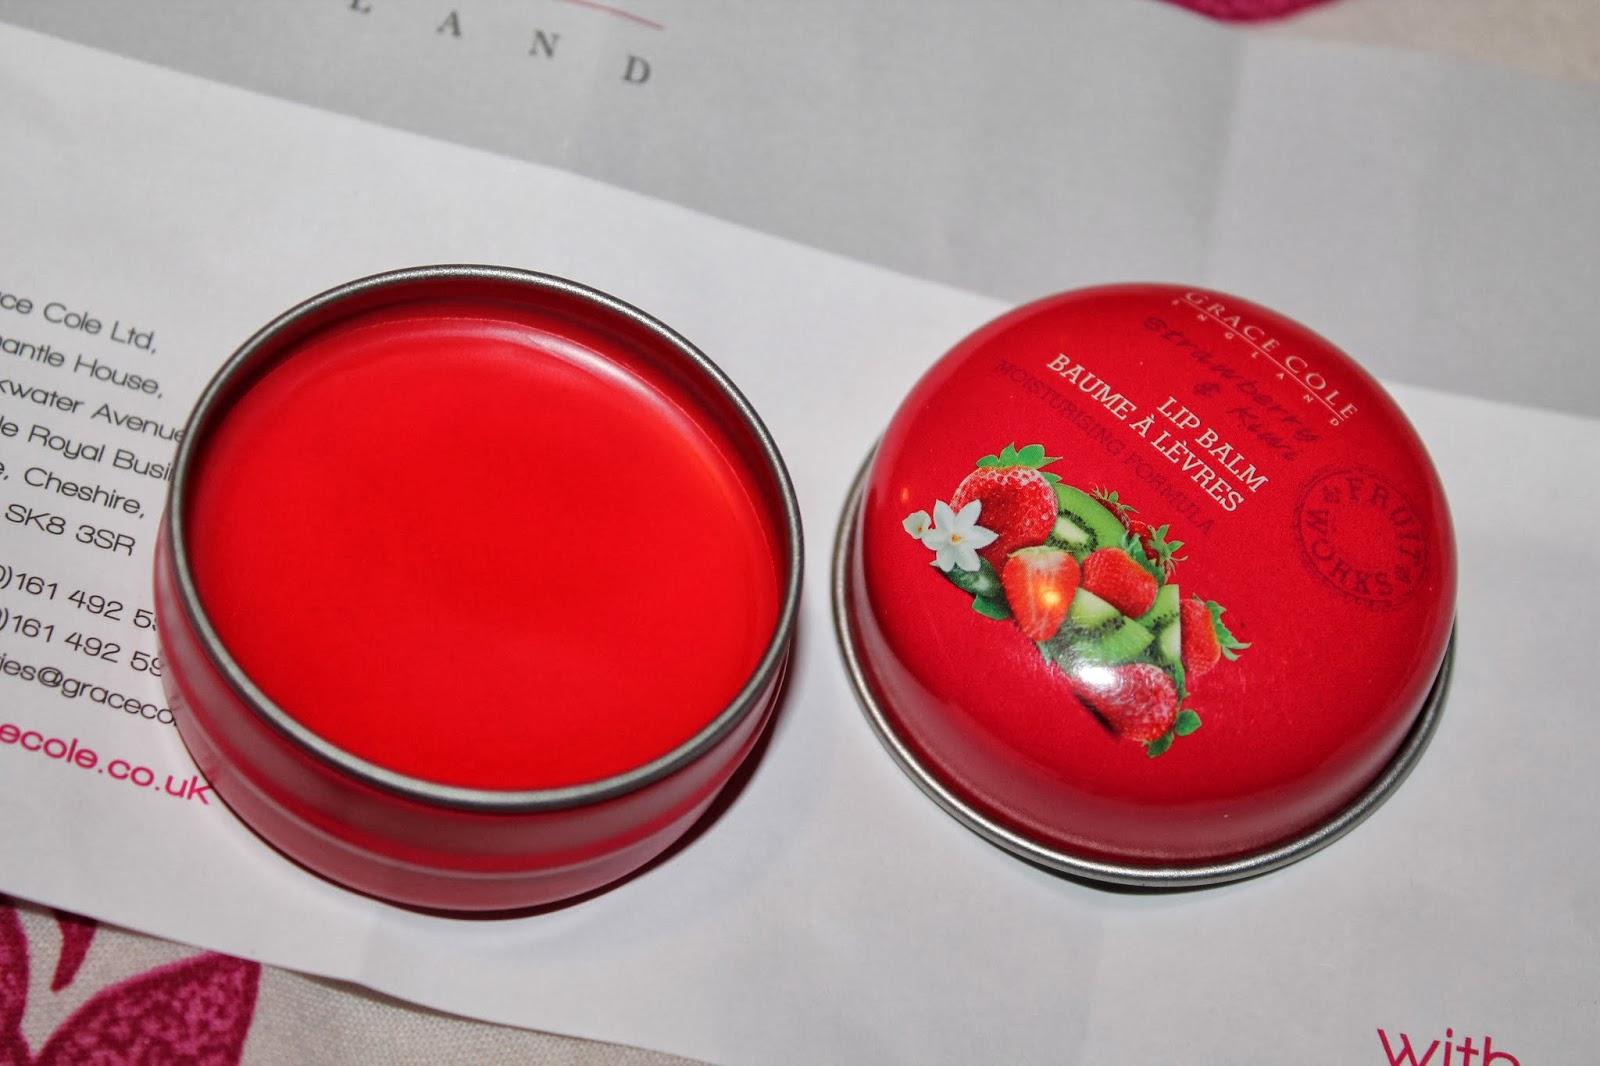 Grace Cole Fruit Works Lip Balm - Strawberry and Kiwi